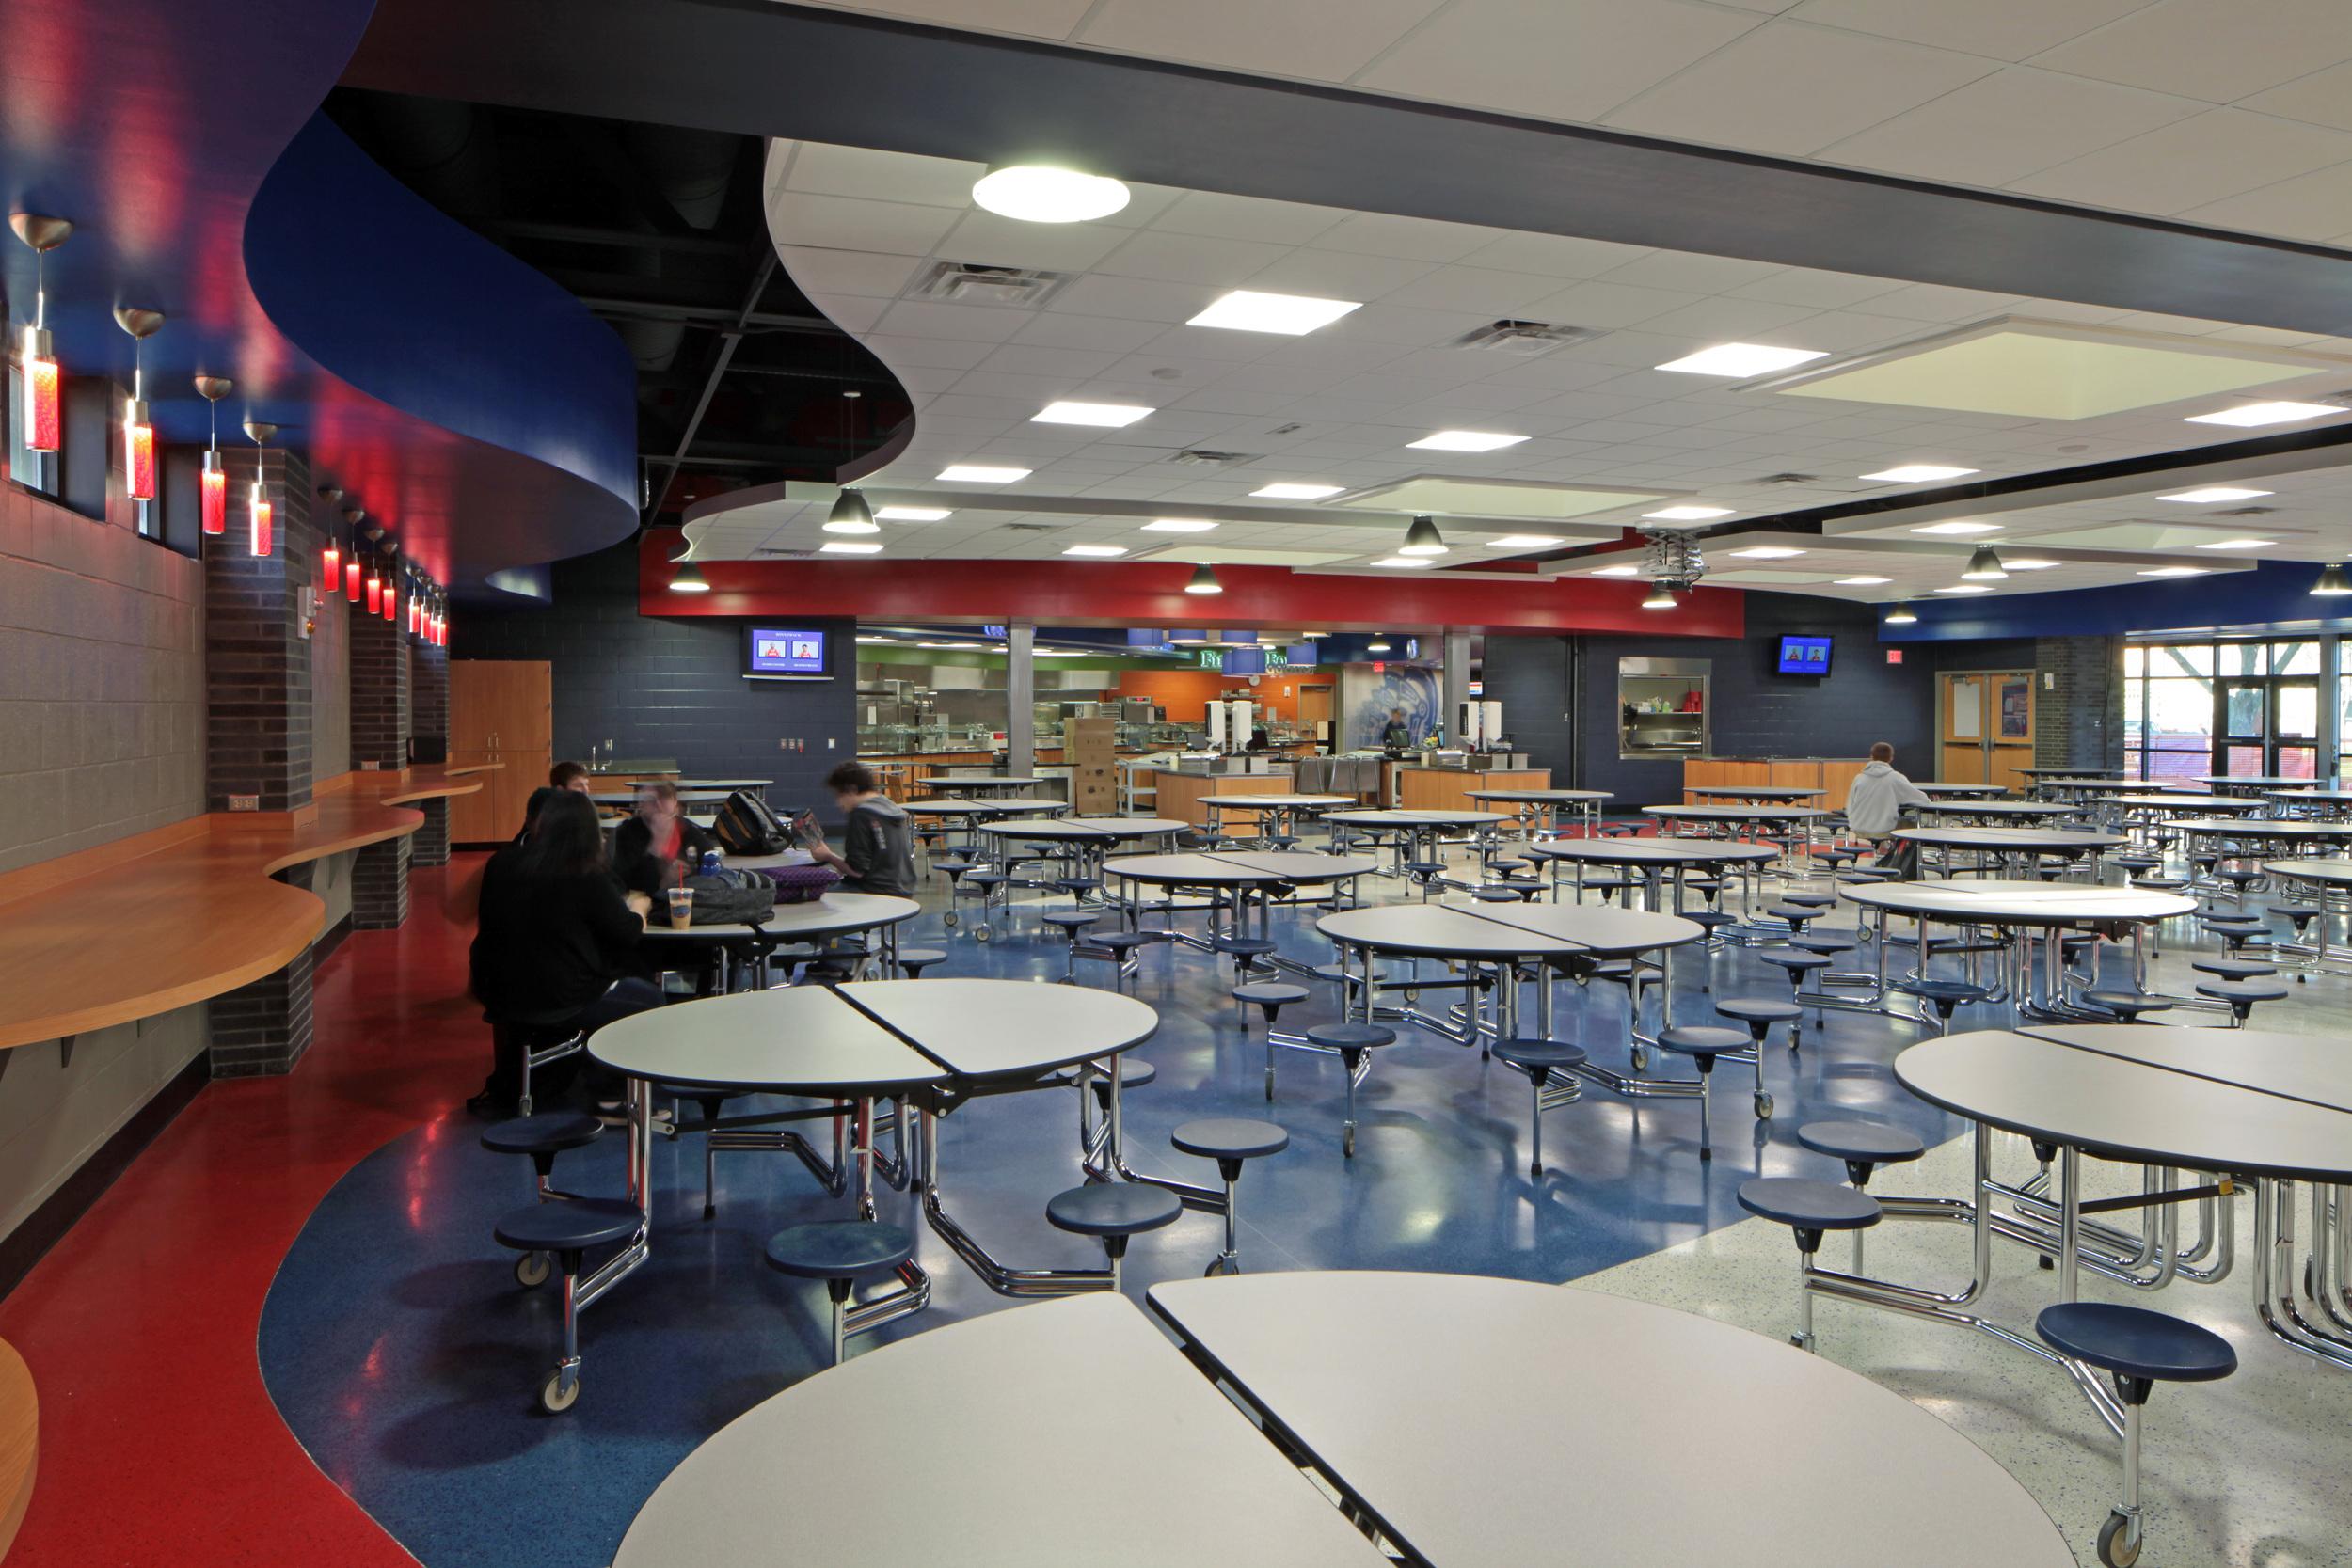 Washington Cafeteria